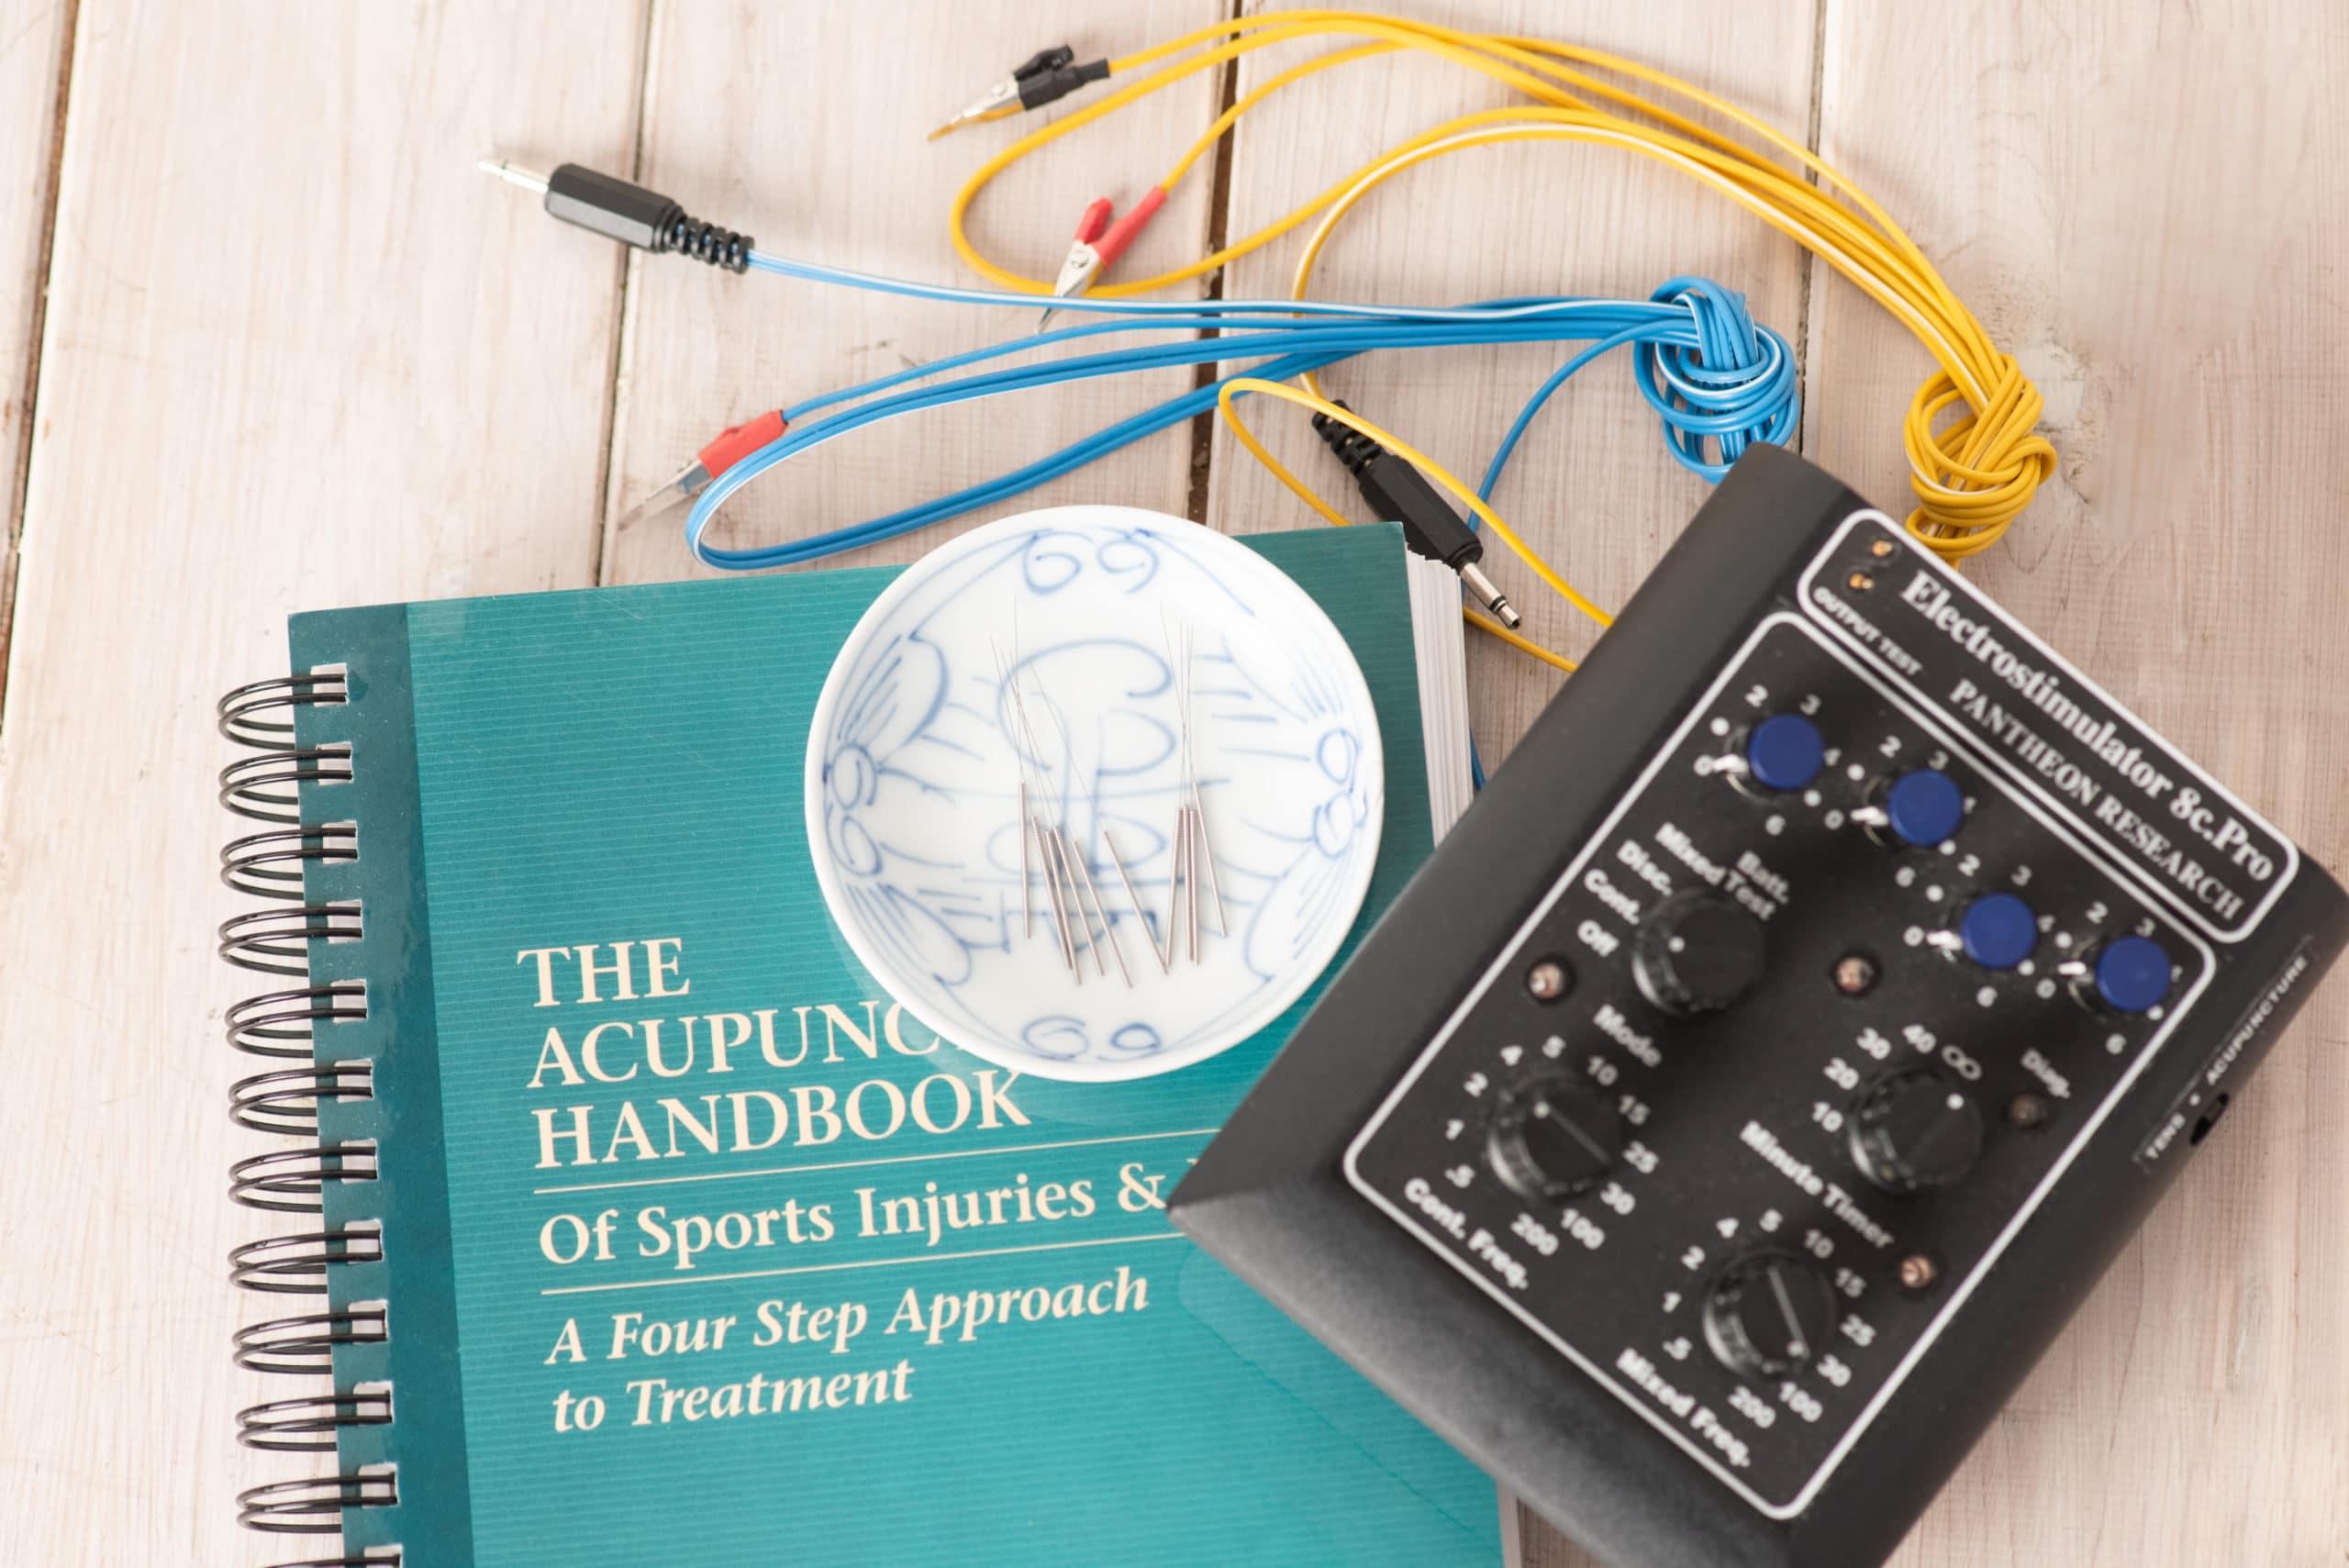 acupuncture treatment tools